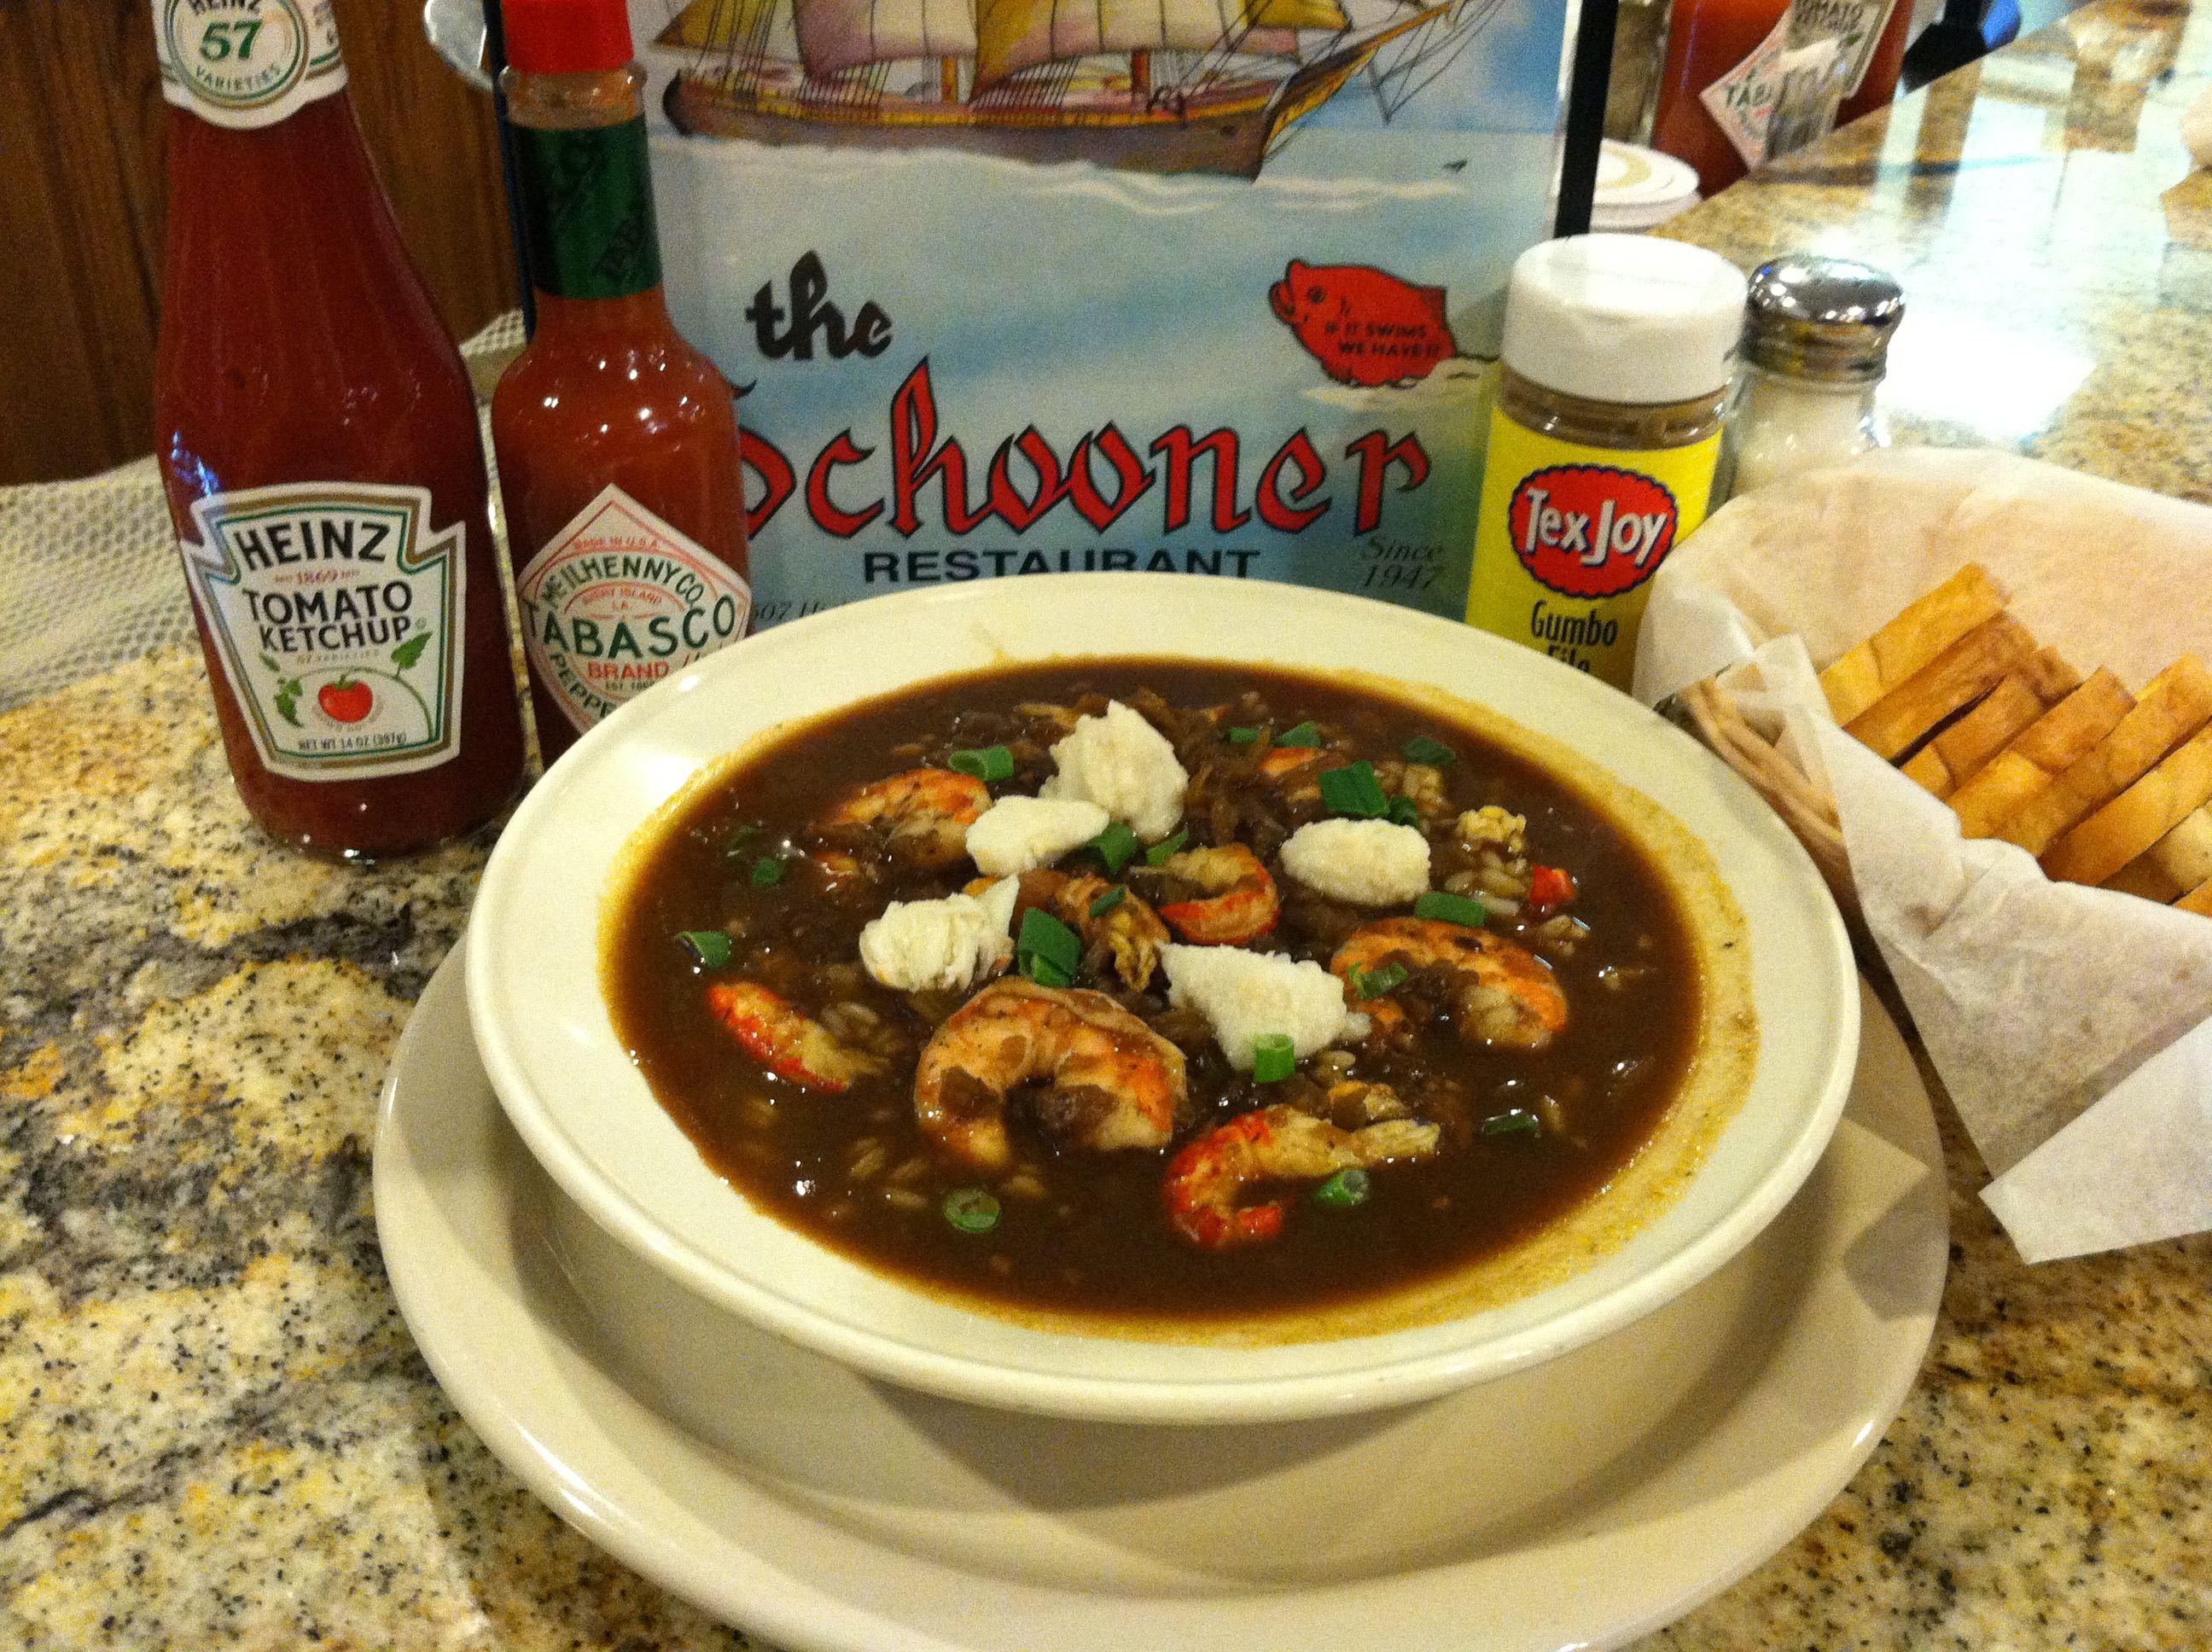 The Schooner Was A Hit At Taste Of Gumbo Dining Menu Food Hot Spicy